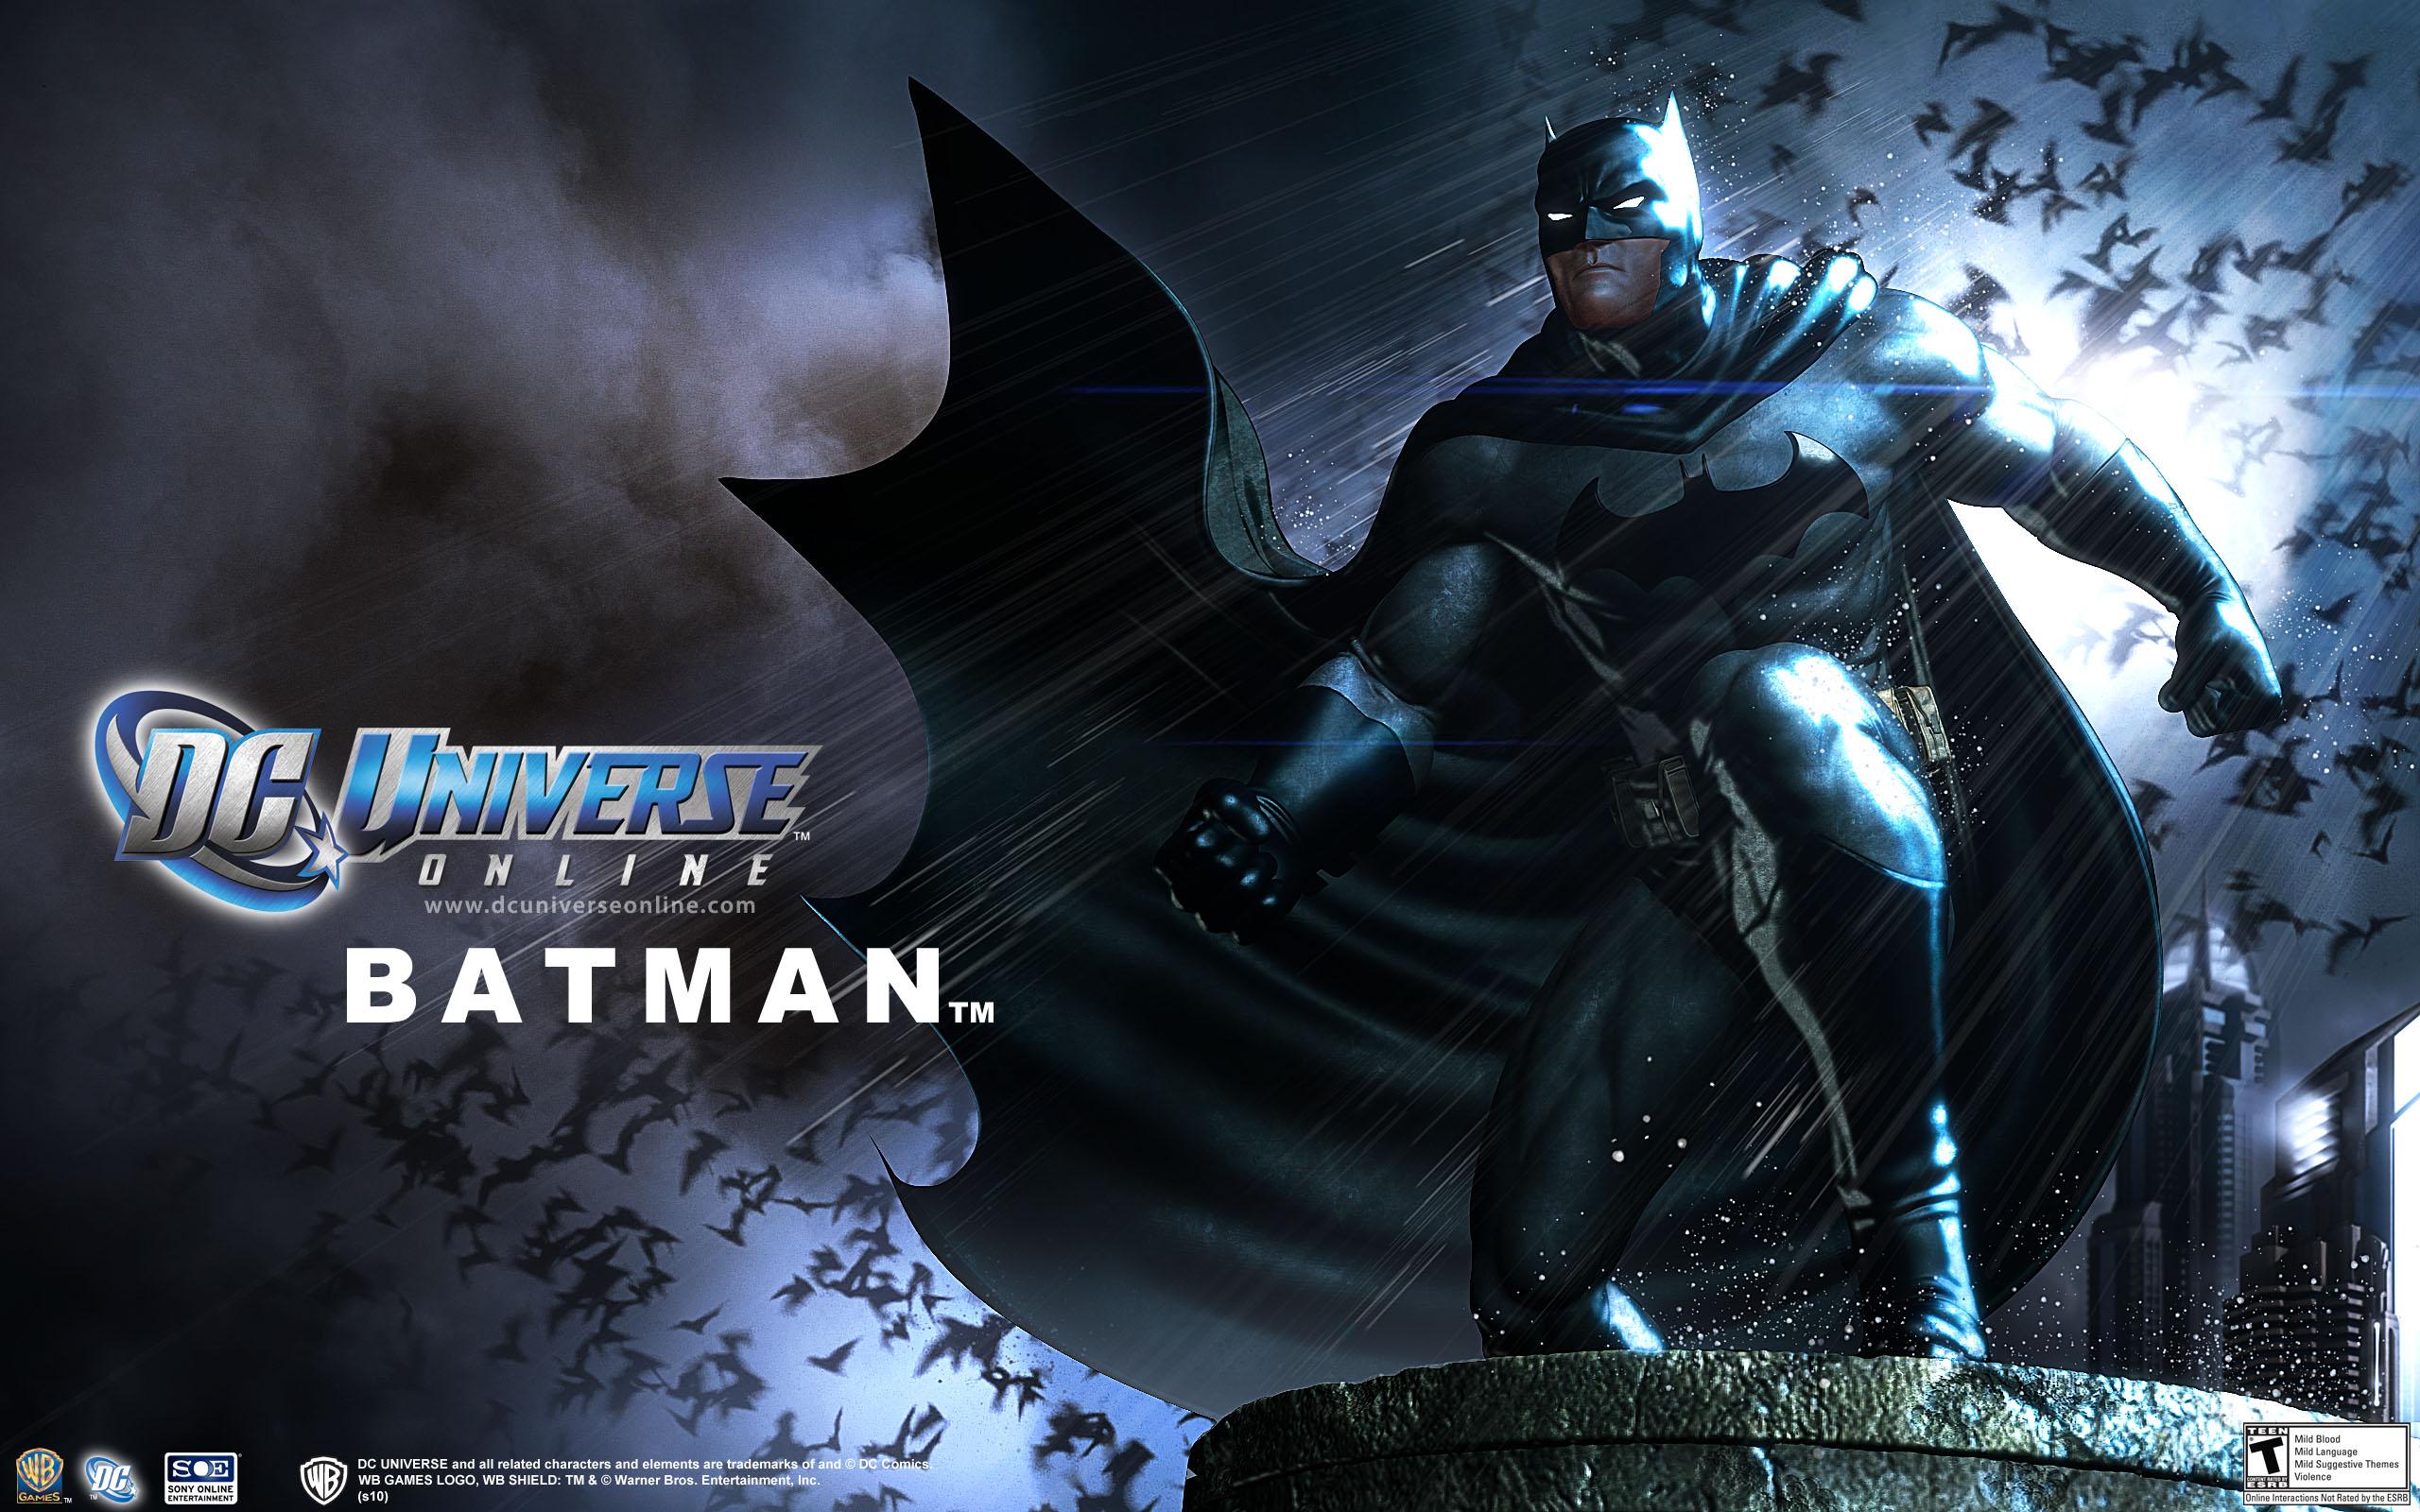 DC Universe Online Batman wallpaper 2560x1600